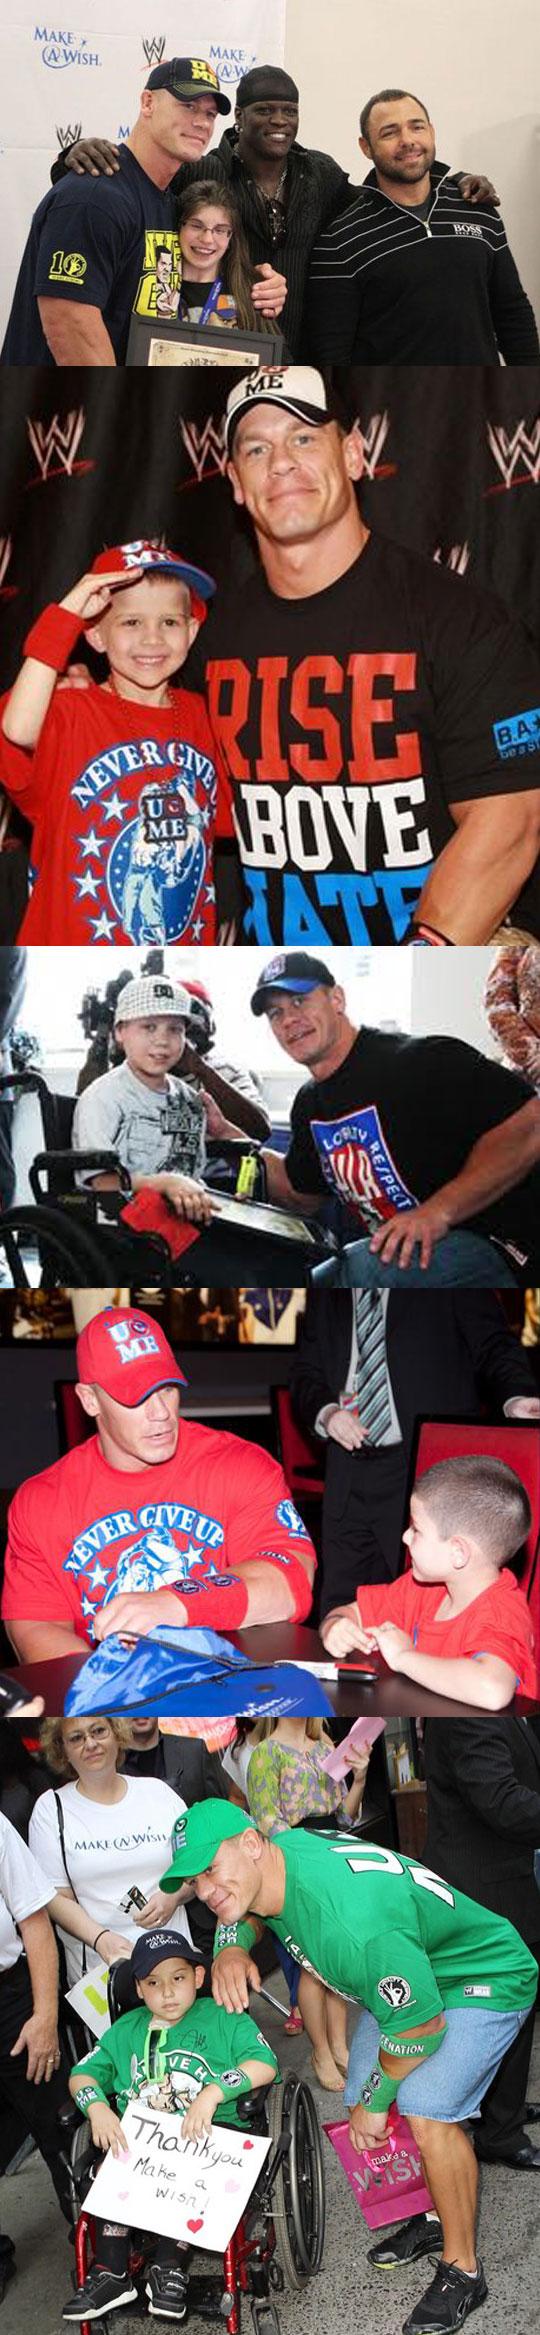 cool-John-Cena-Make-A-Wish-kids-wheelchair